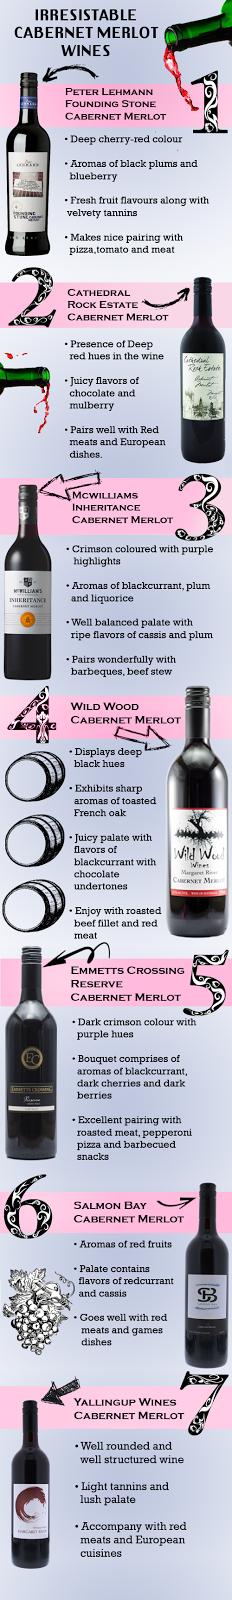 Irresistable Cabernet Merlot Wines